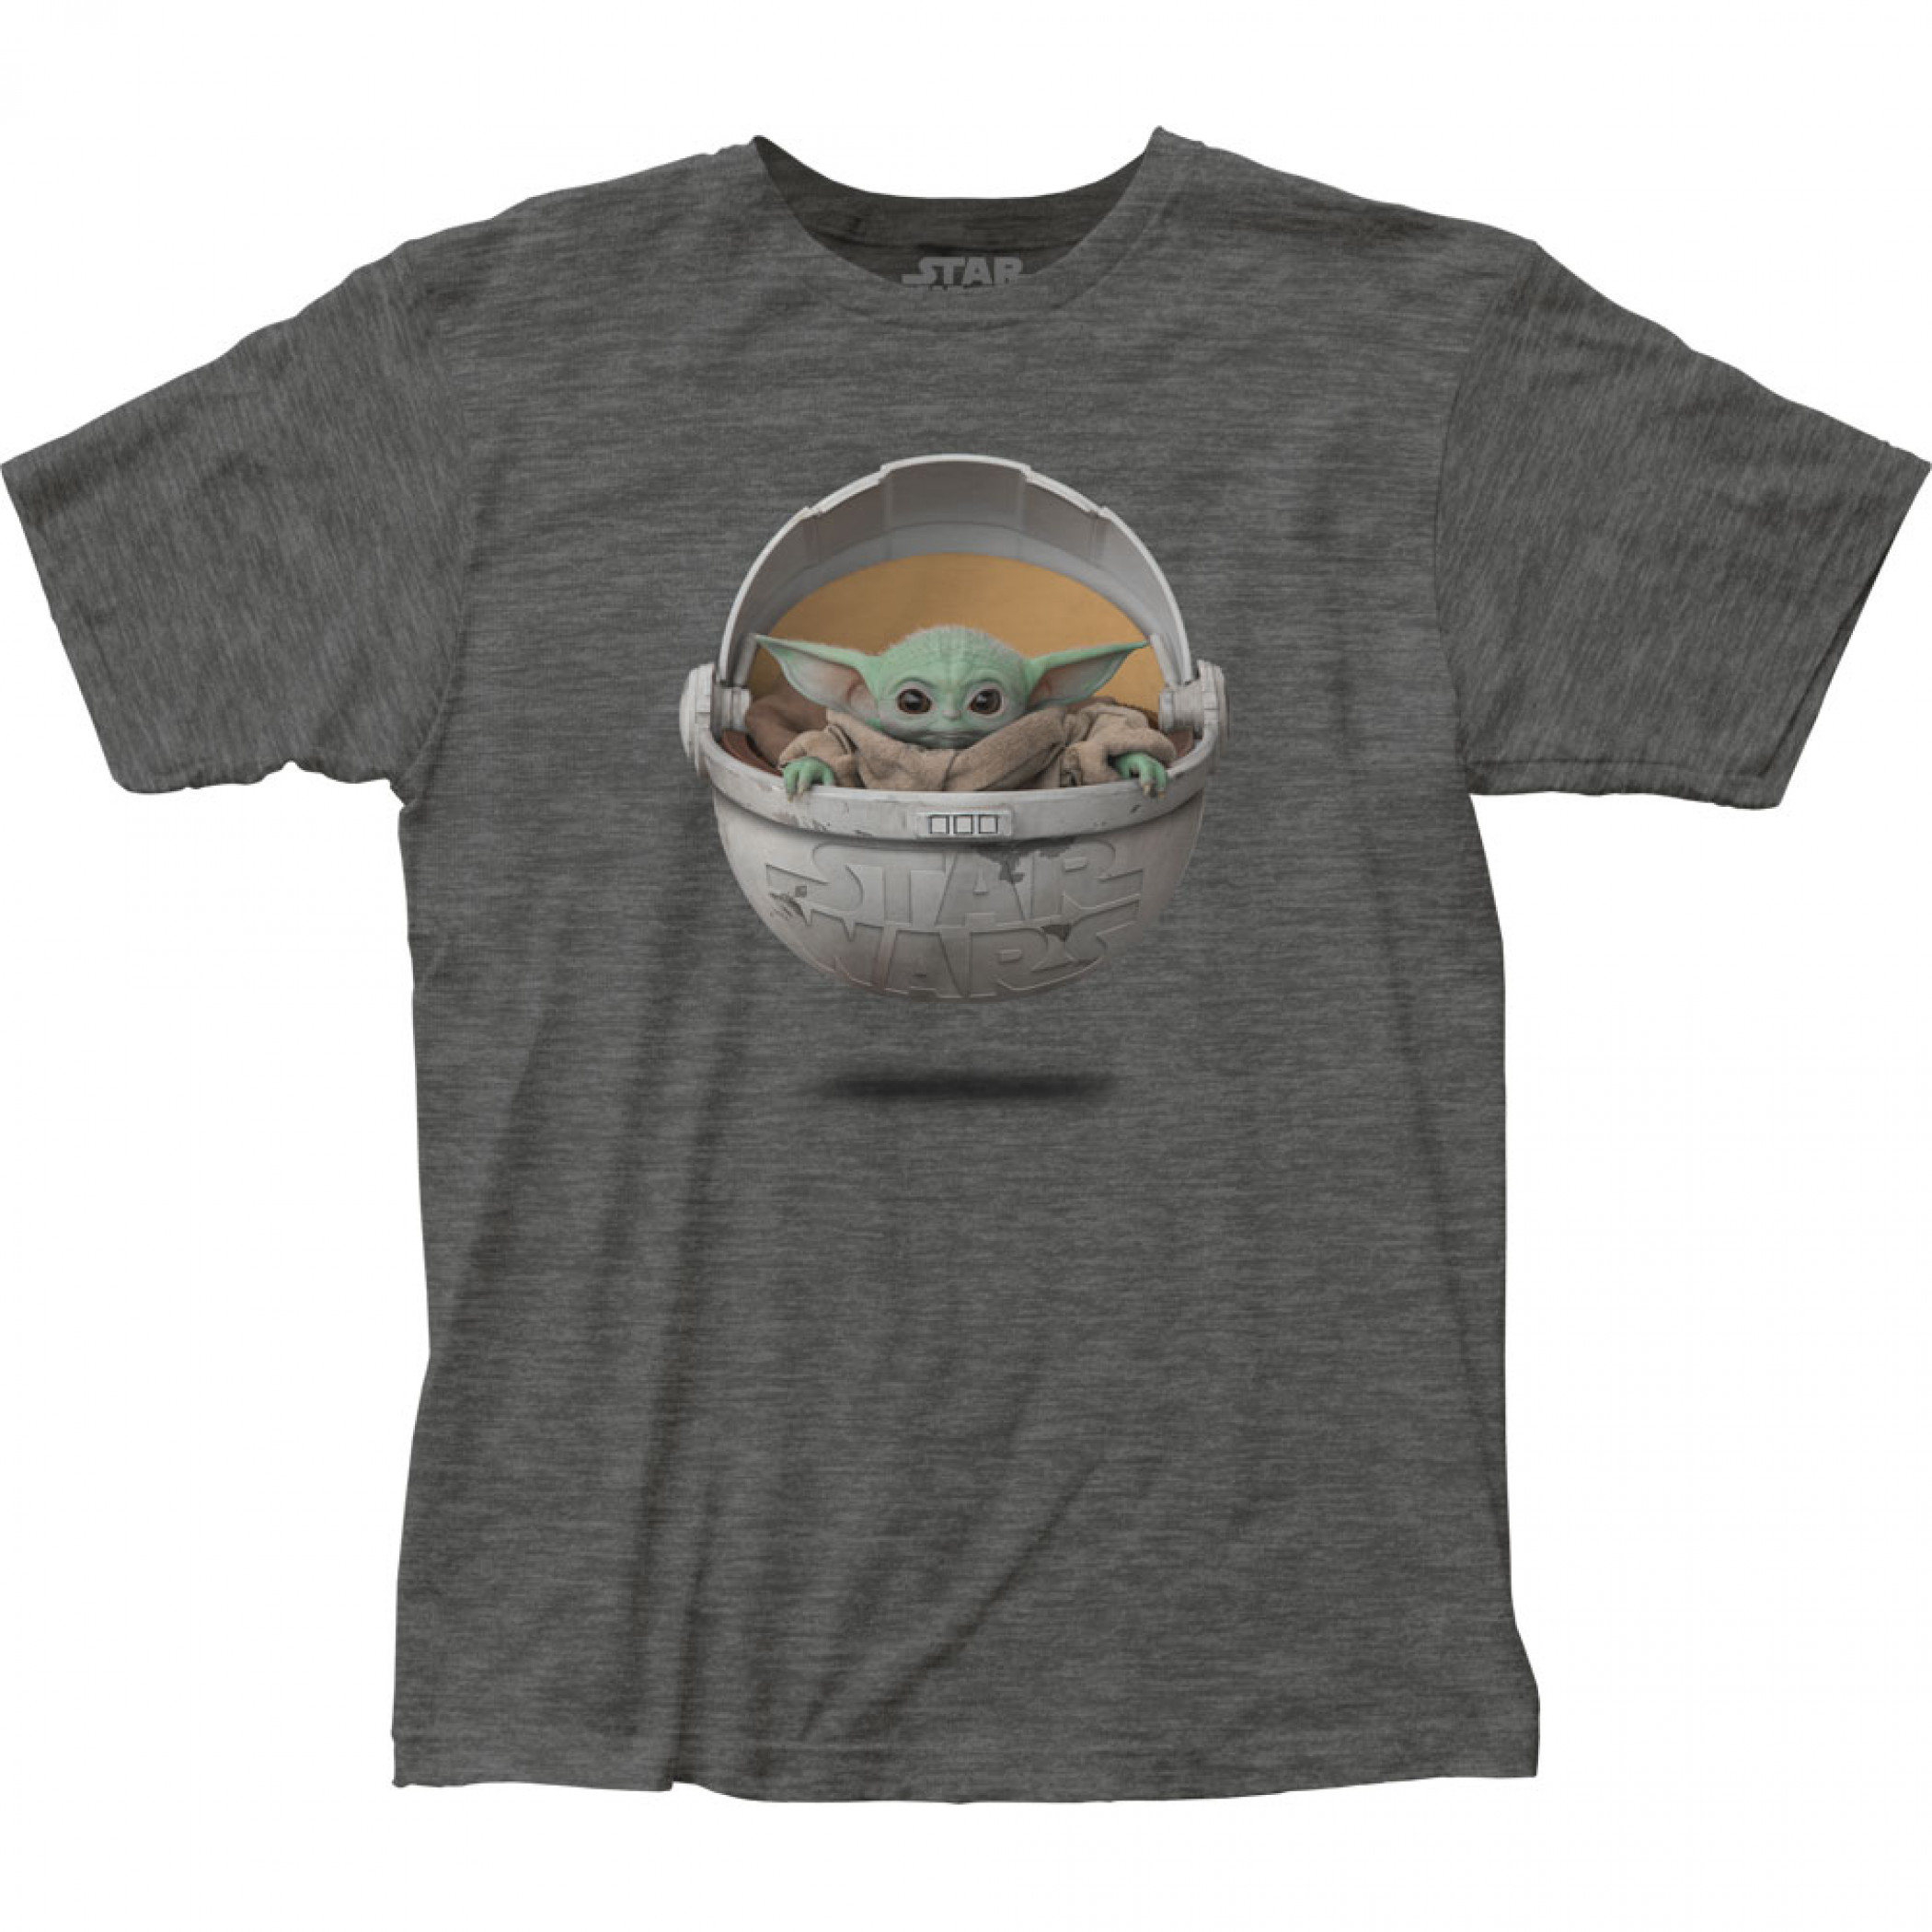 Star Wars The Mandalorian The Child Space Crib T-Shirt